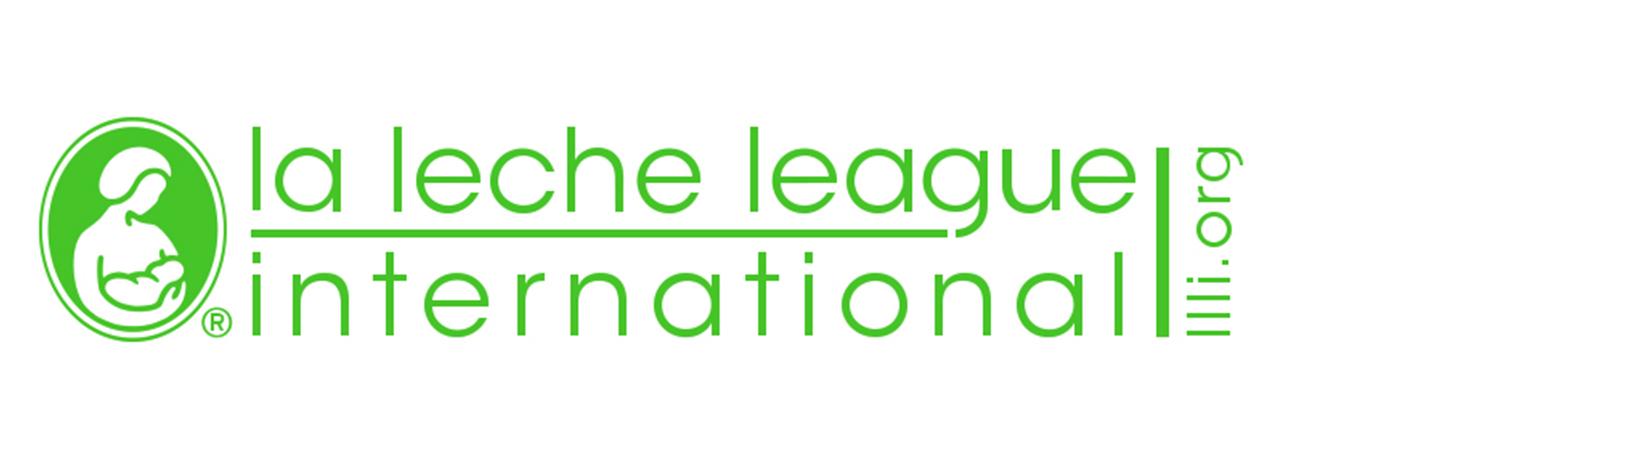 La Leche League International